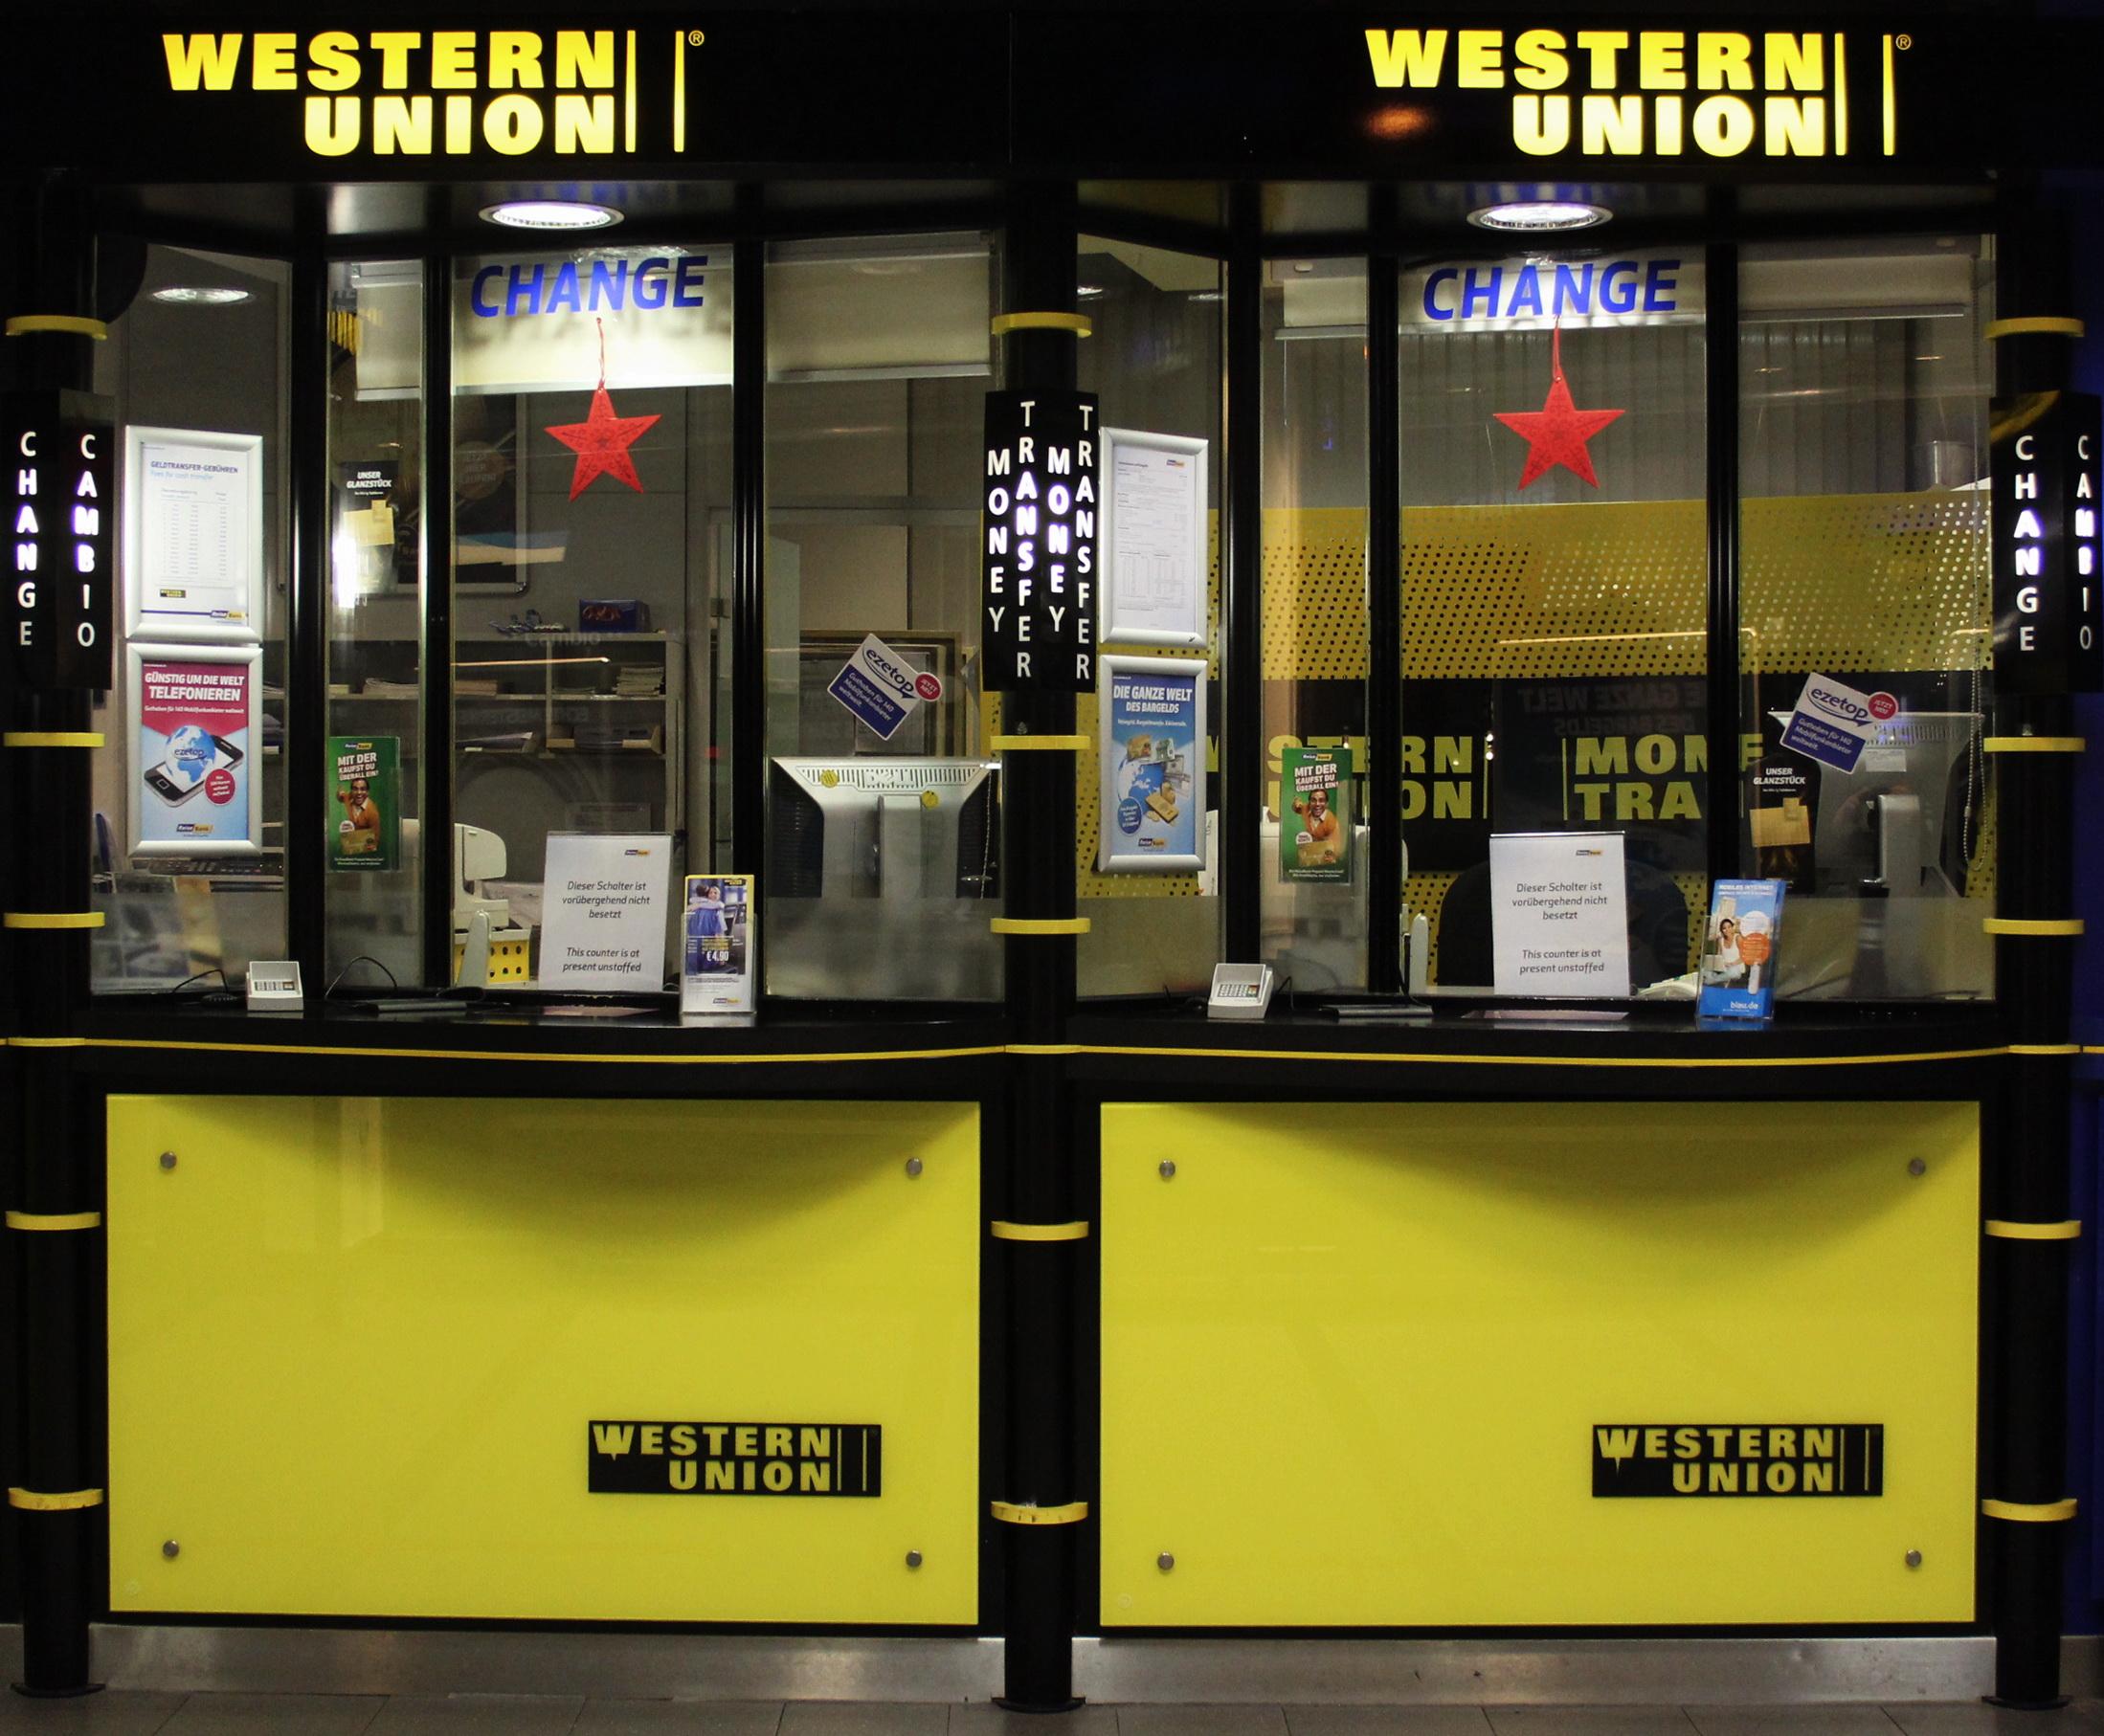 file western union schalter am hauptbahnhof muenchen jpg wikimedia commons. Black Bedroom Furniture Sets. Home Design Ideas